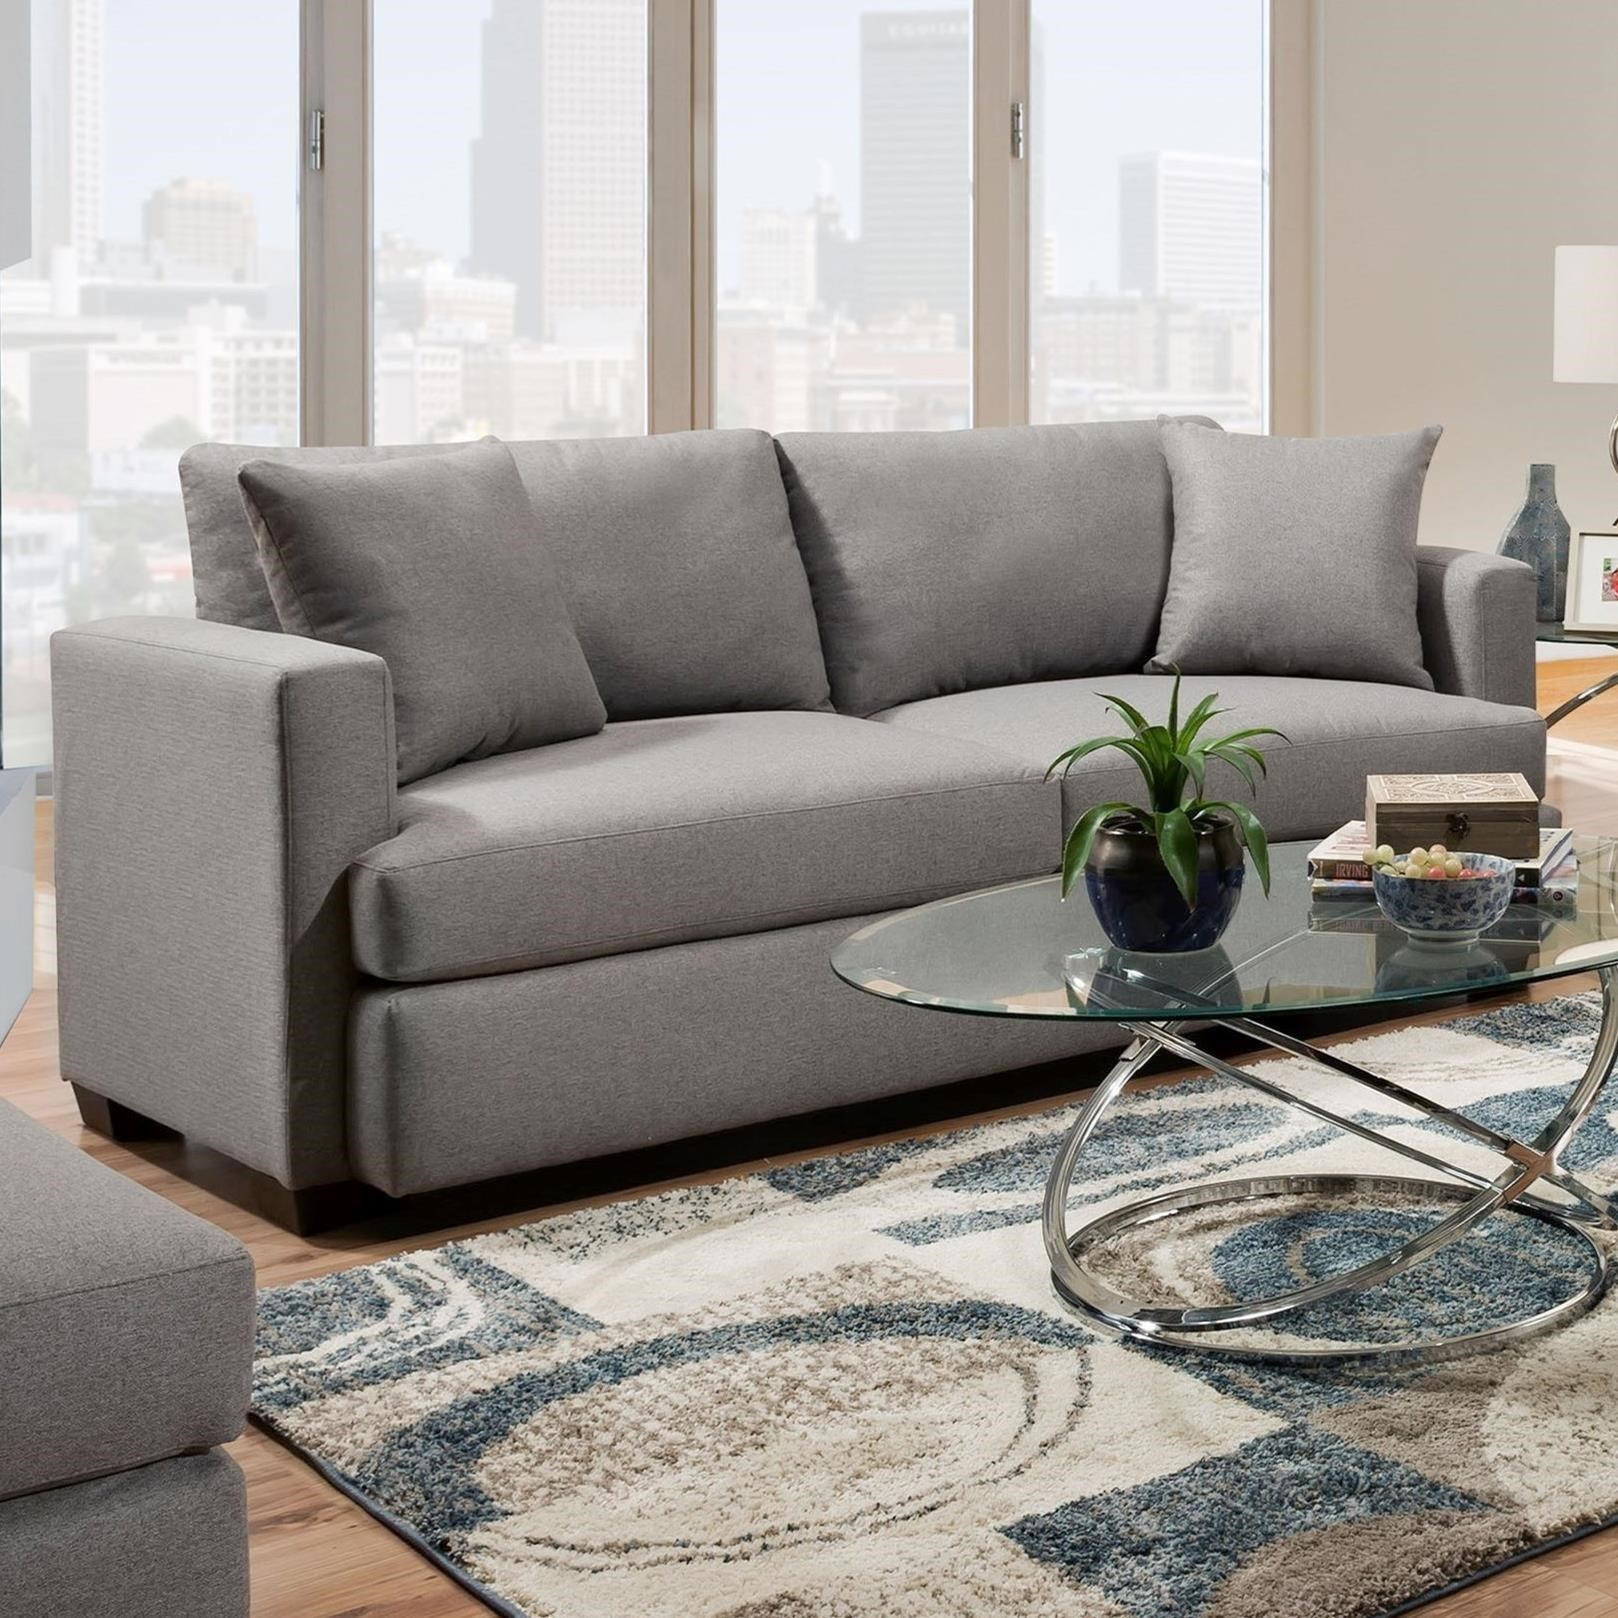 5300 Sofa by Peak Living at Prime Brothers Furniture